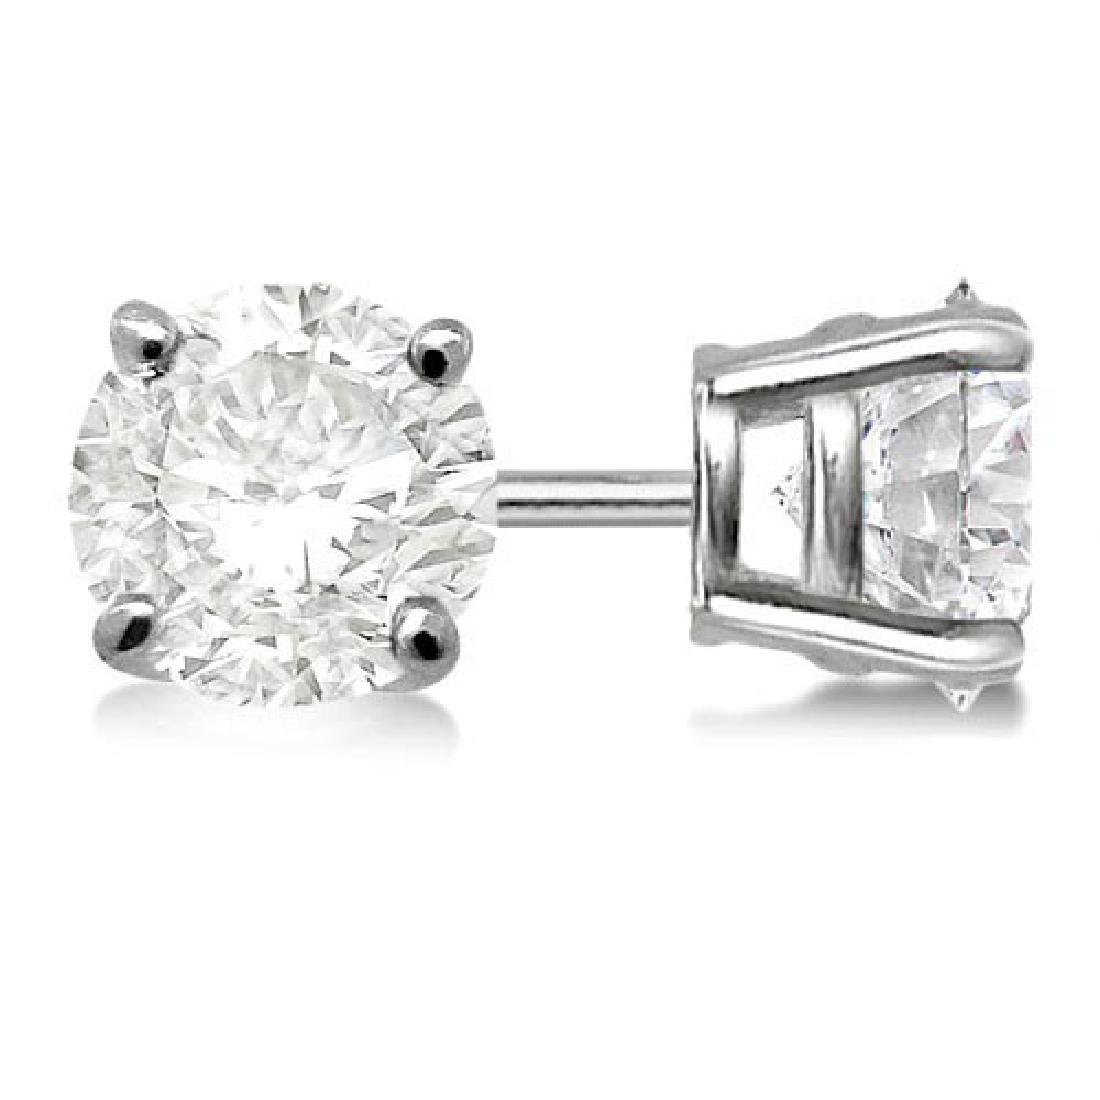 Certified 1.33 CTW Round Diamond Stud Earrings J/I2